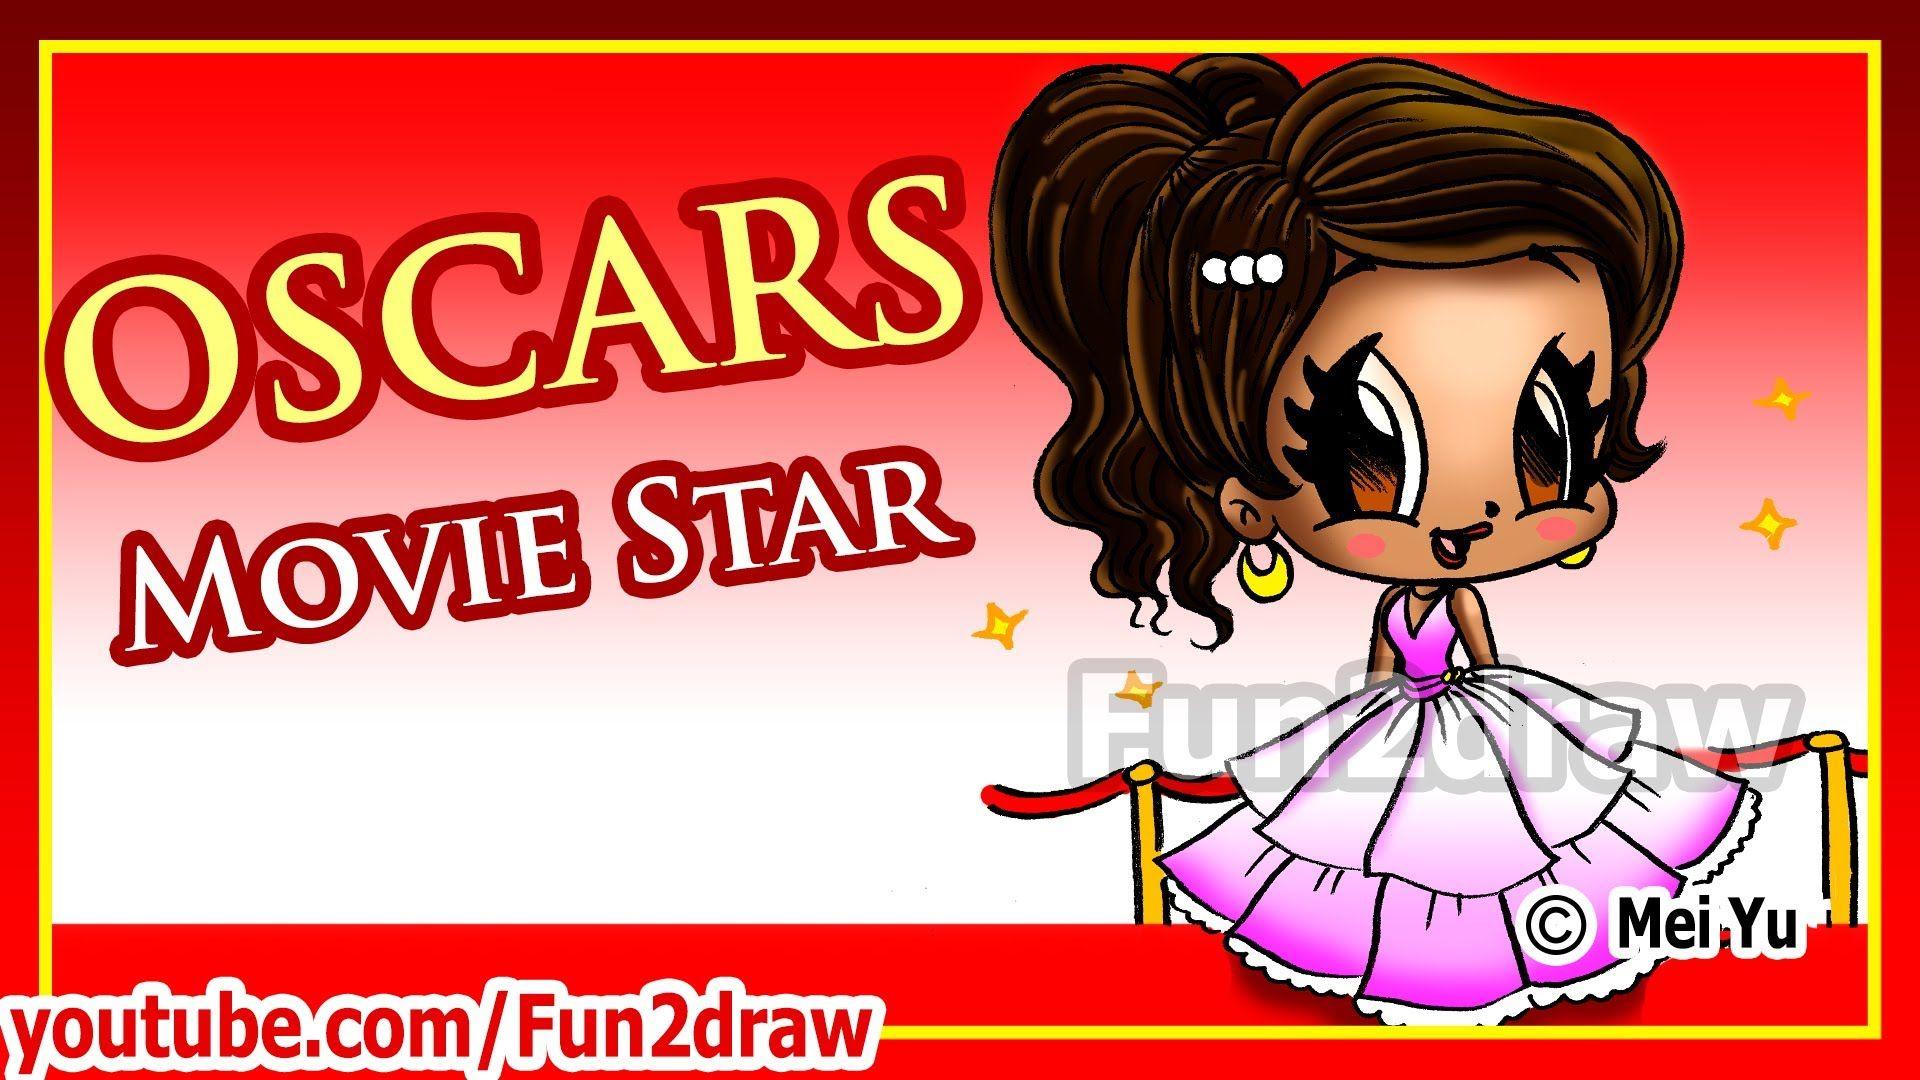 How to draw oscars beautiful movie star fun2draw for Fun to draw people